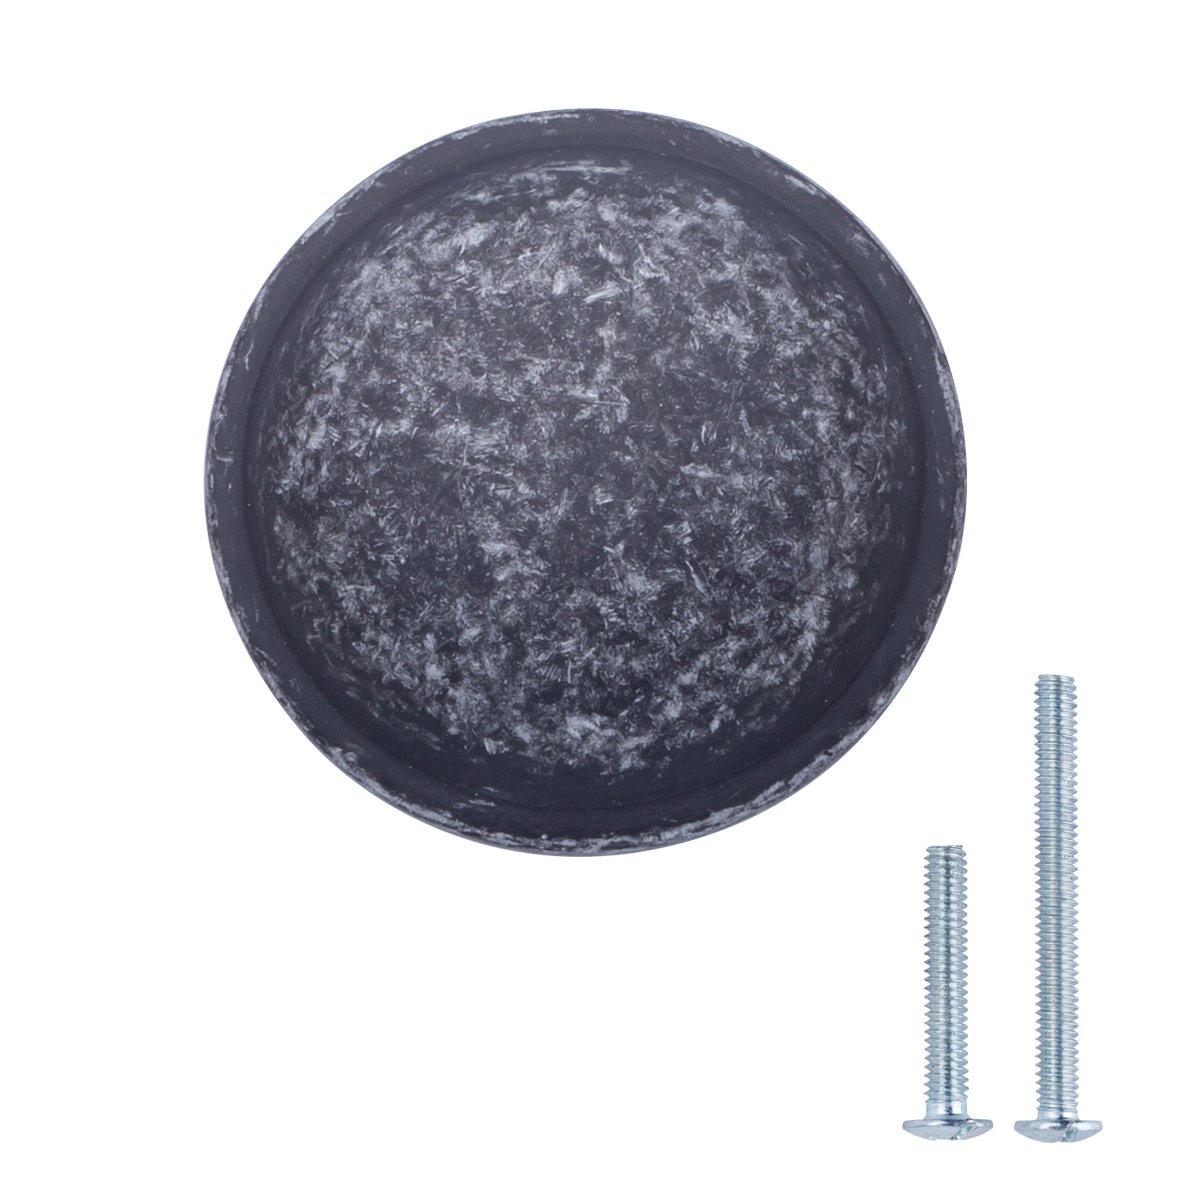 "AmazonBasics (AB300-AS-25) Mushroom Cabinet Knob, 1.19"" Diameter, Antique Silver, 25-Pack"